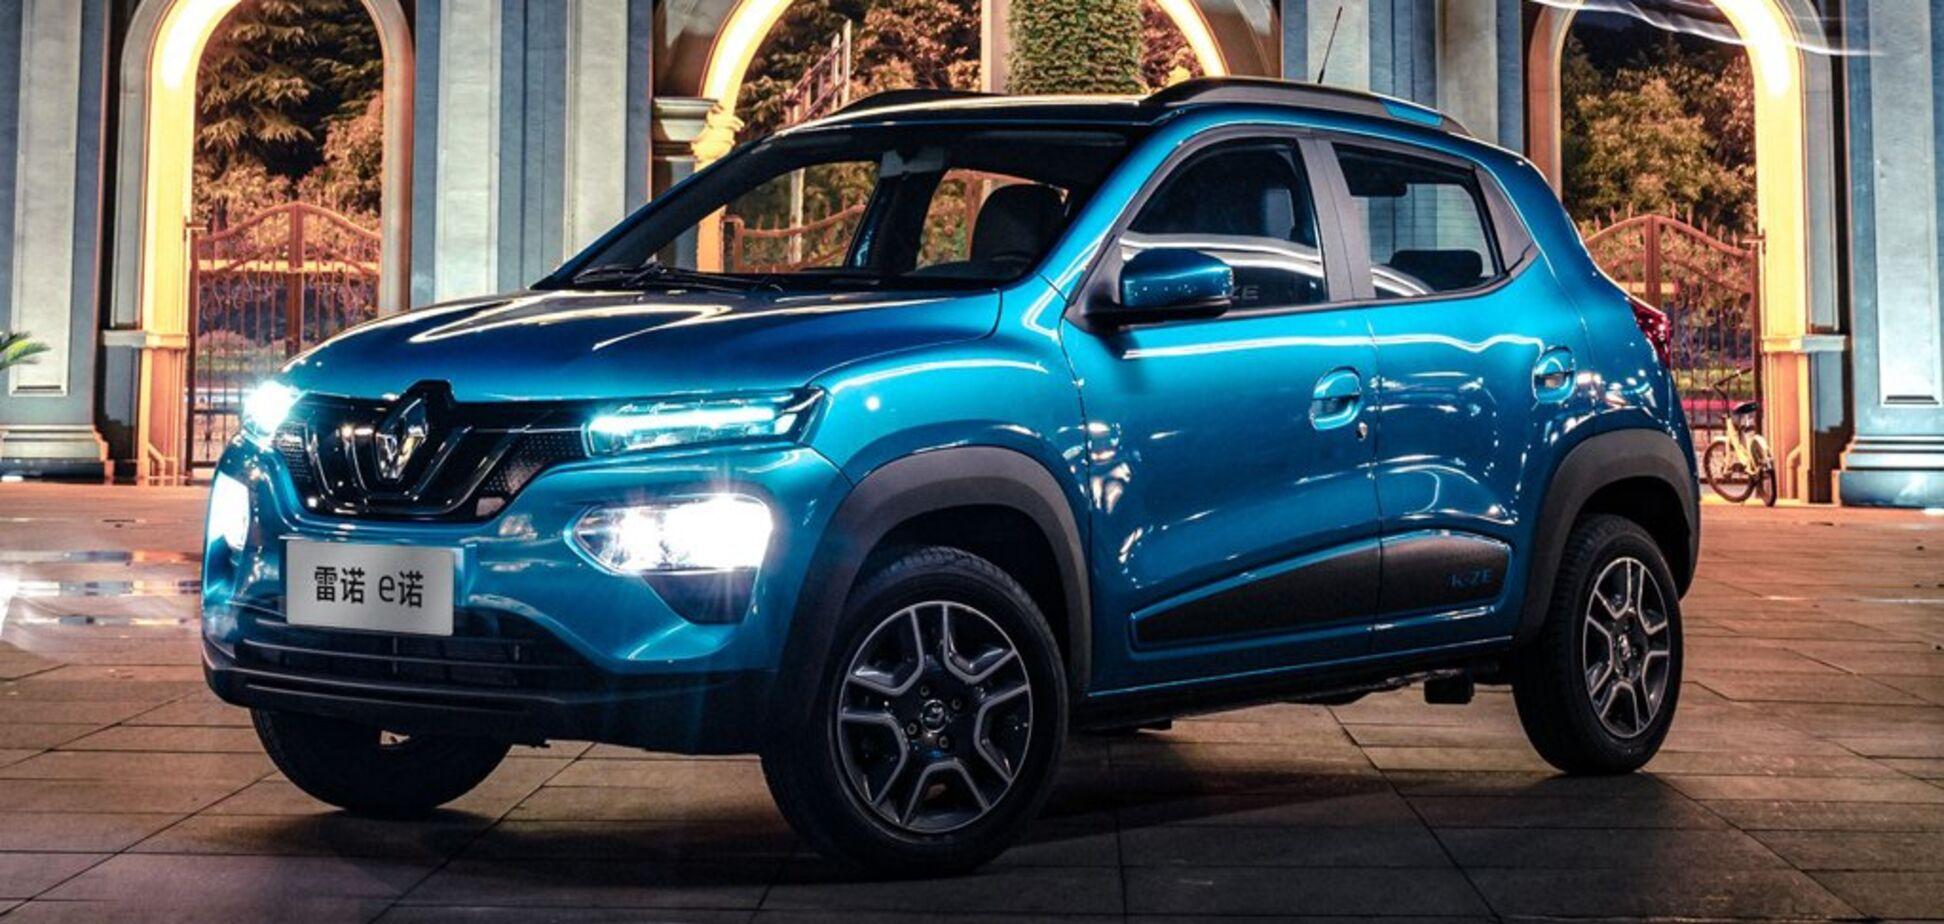 Renault предложит в Европе электрический кроссовер за 9000 евро